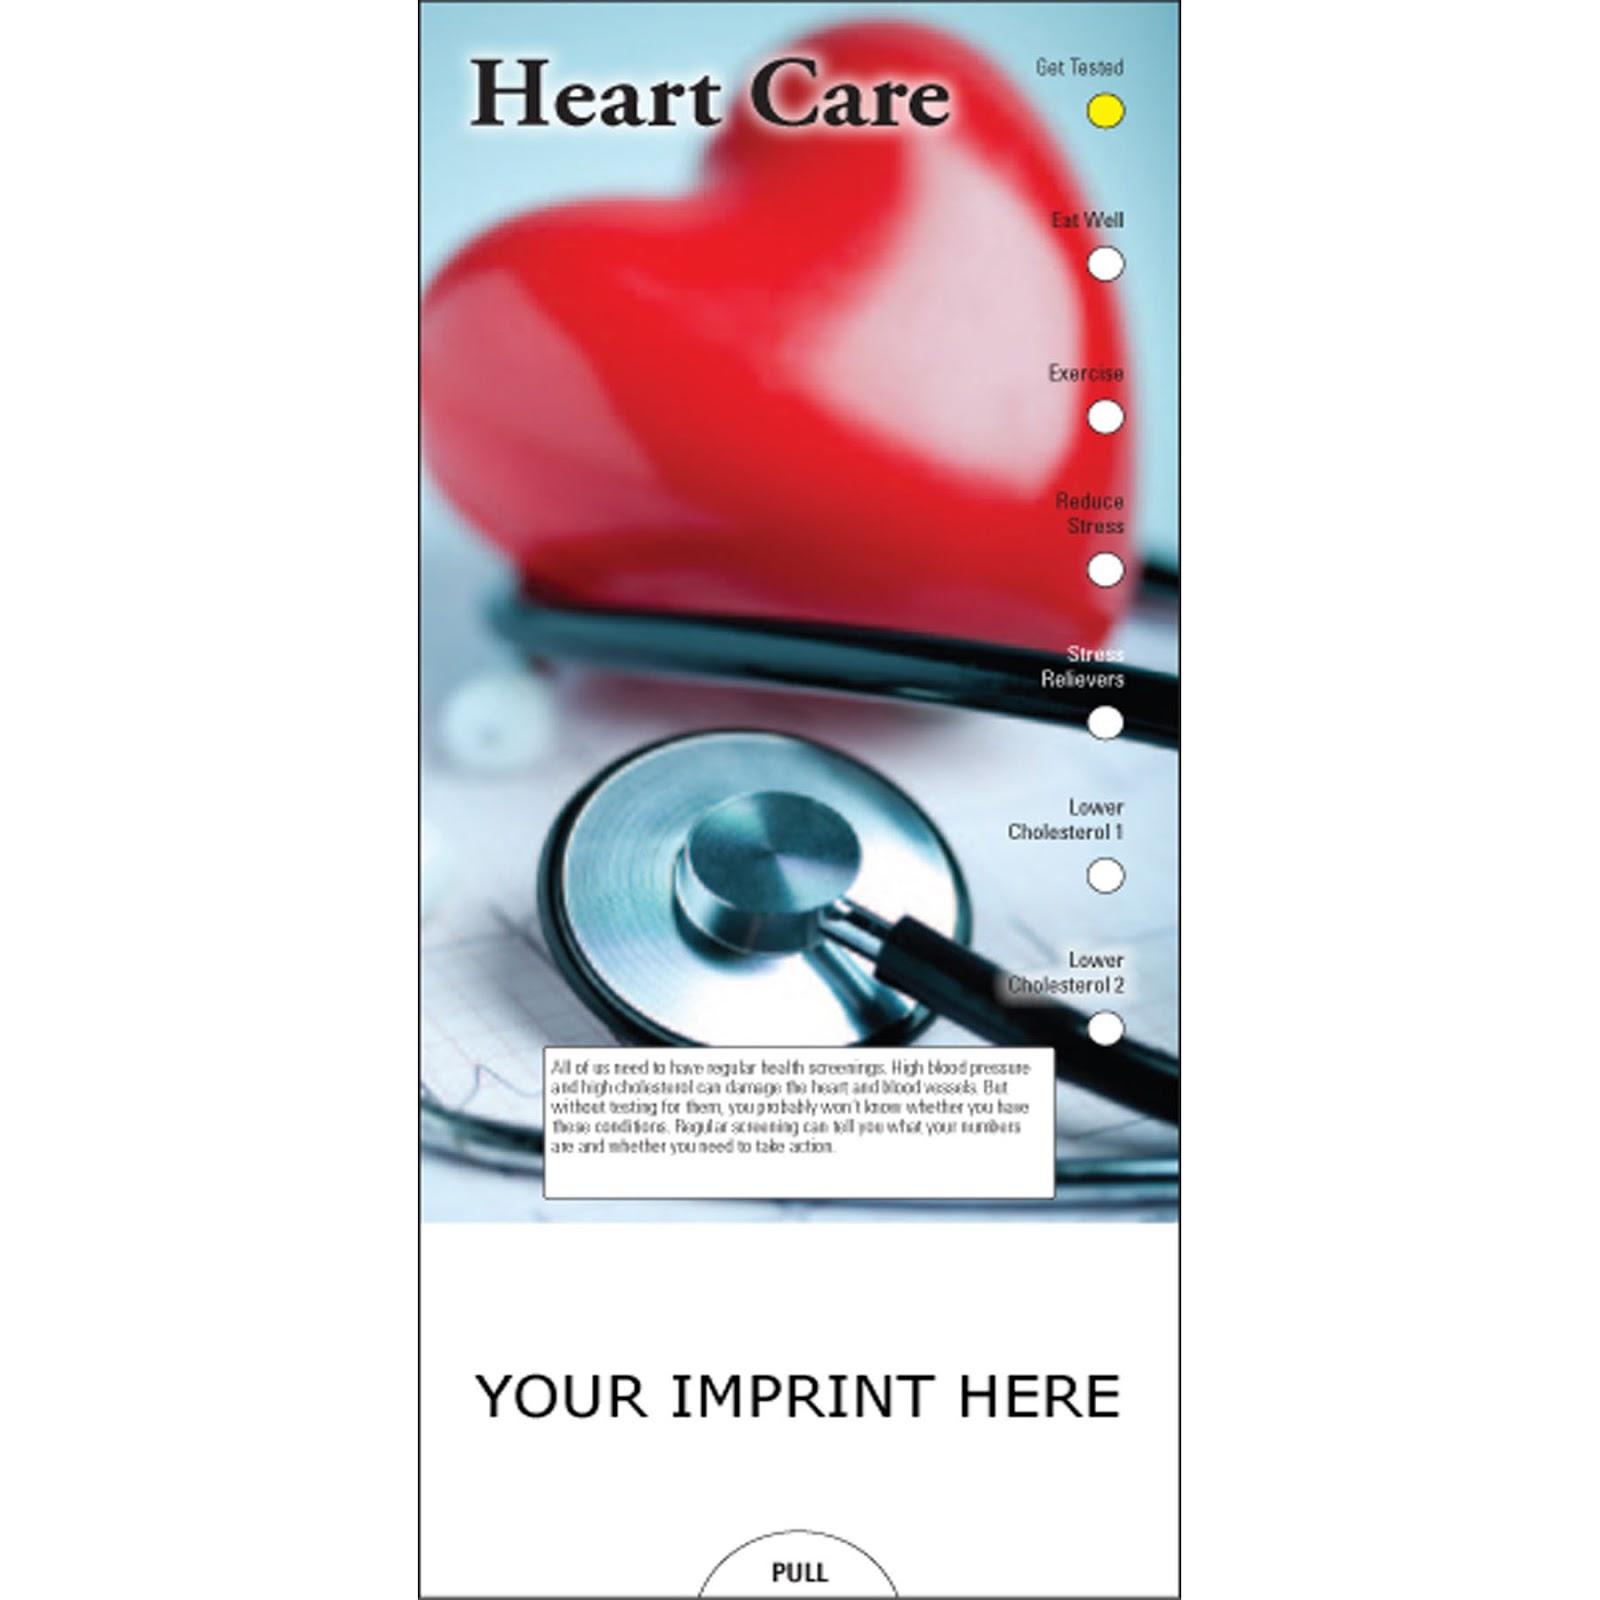 corporate health guide